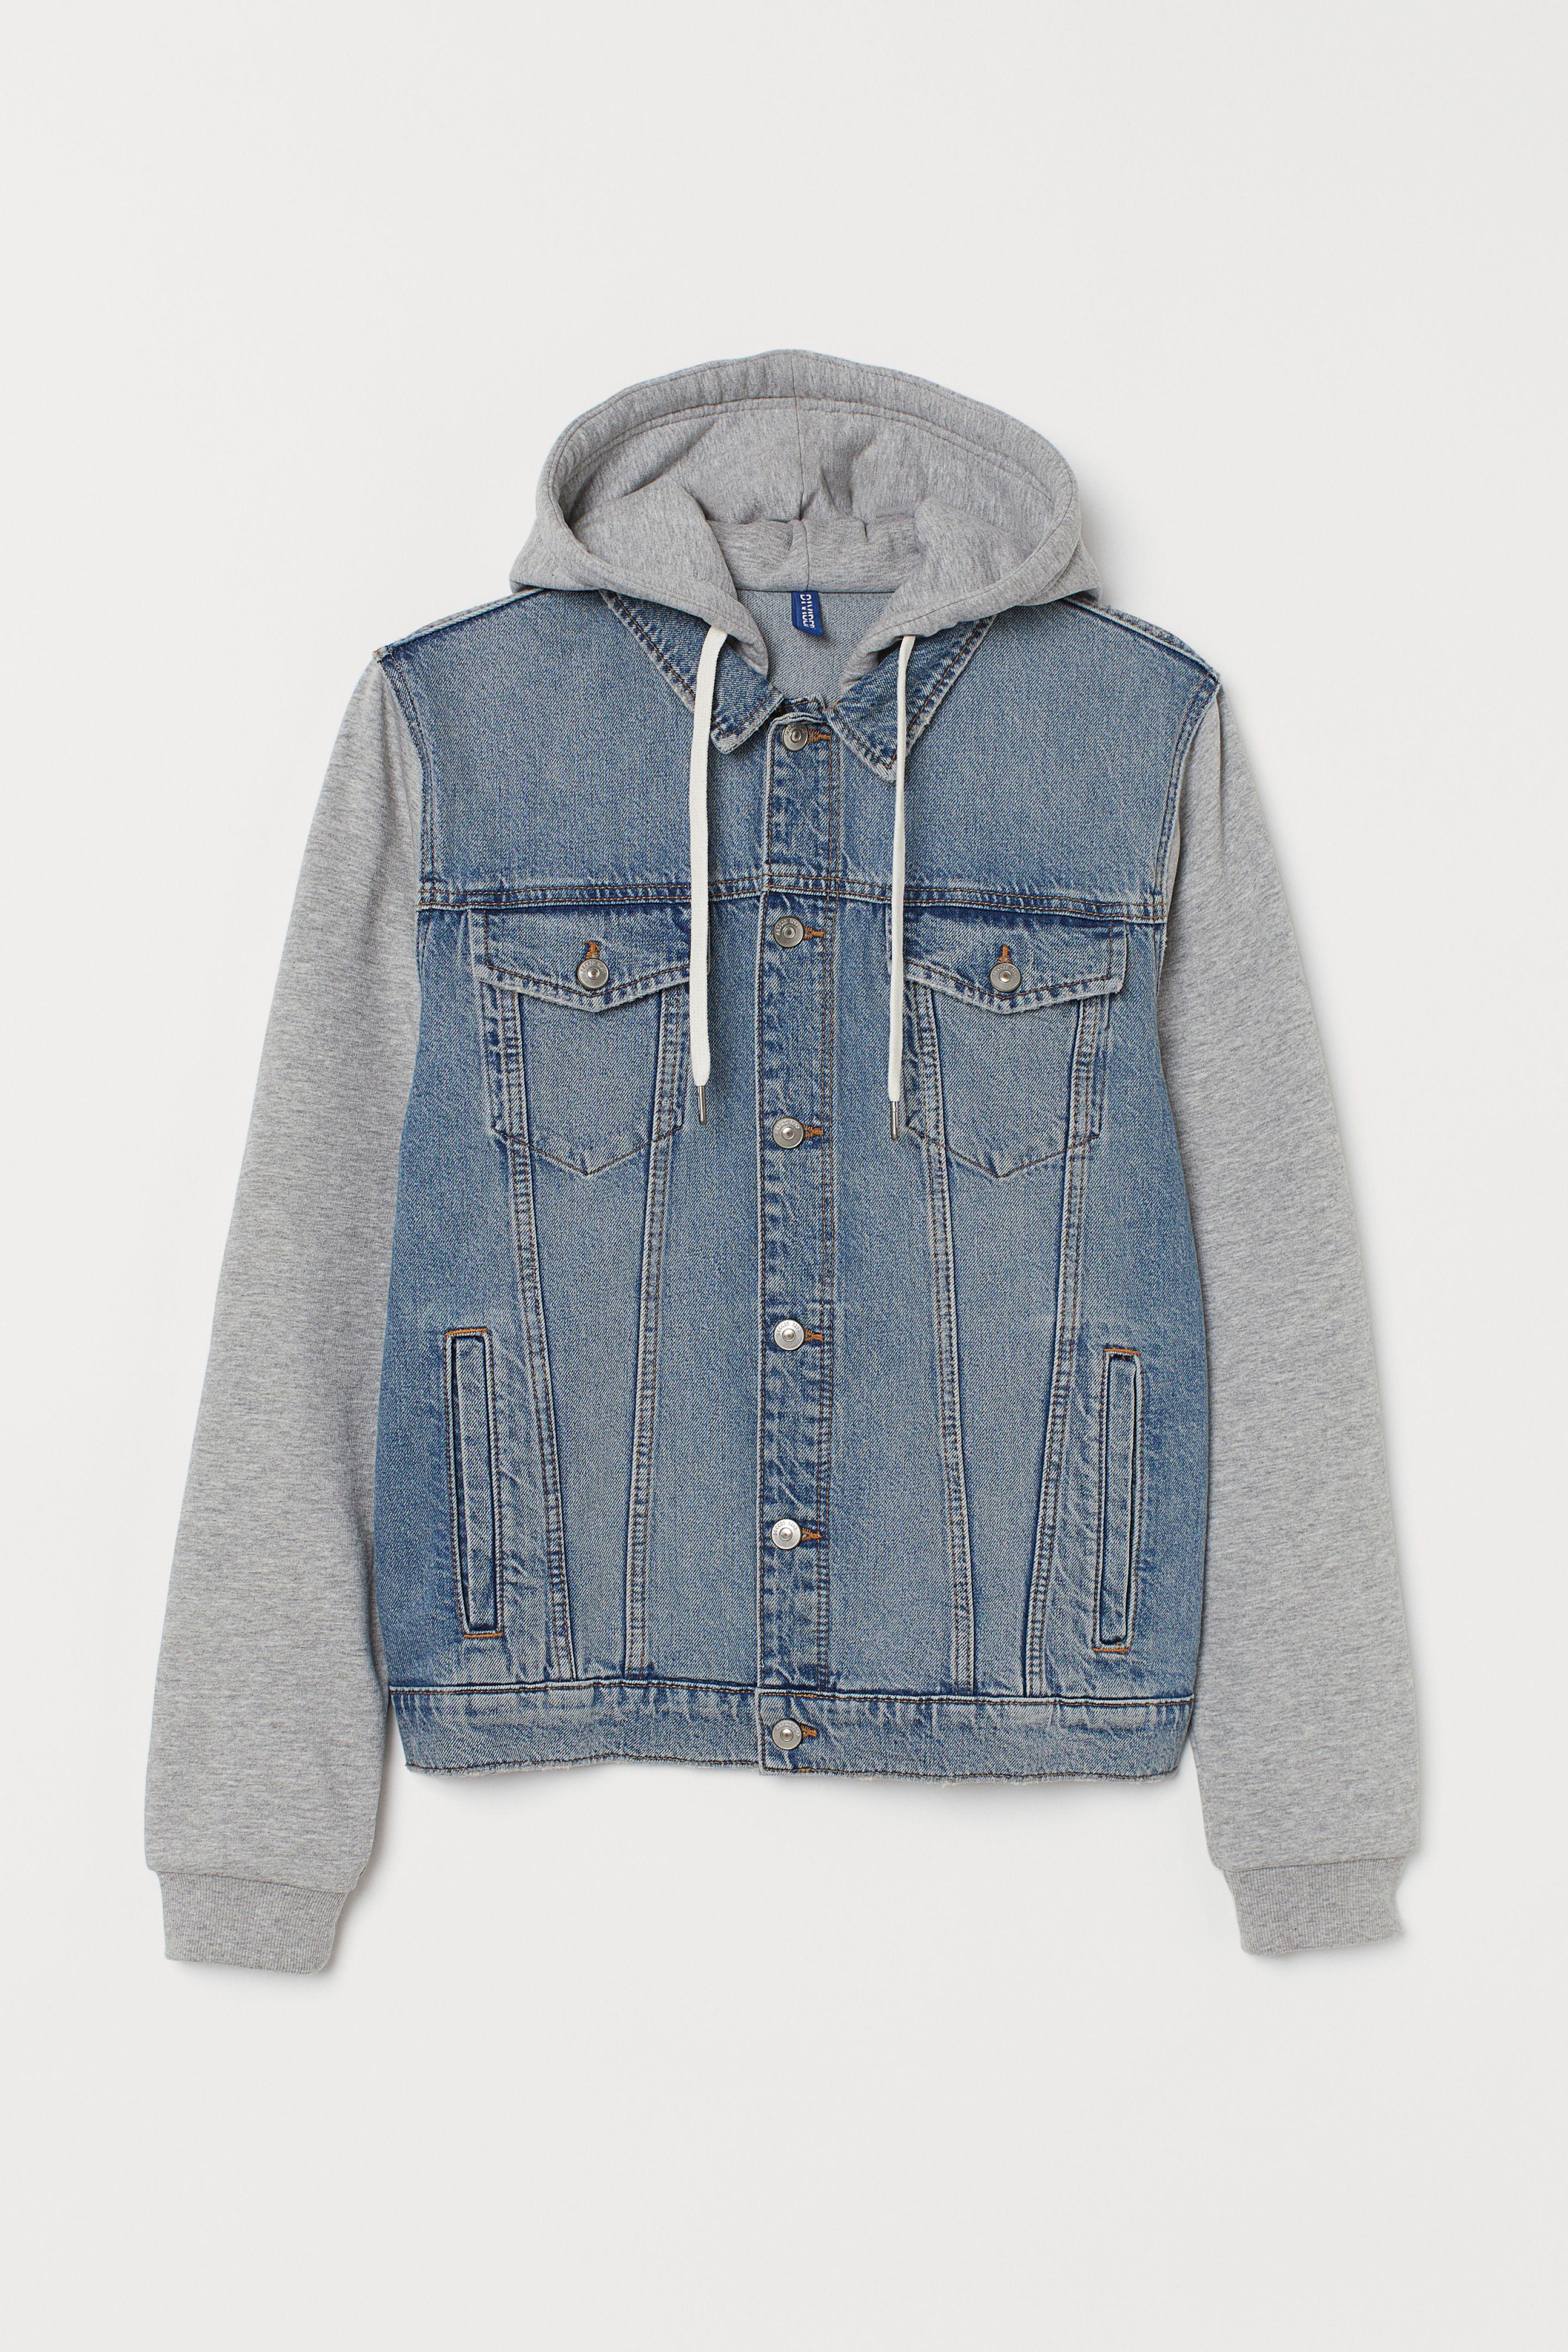 Hooded Denim Jacket Denim Blue Gray Men H M Us In 2021 Hooded Denim Jacket Denim Jacket Jean Sweater Jacket [ 4320 x 2880 Pixel ]